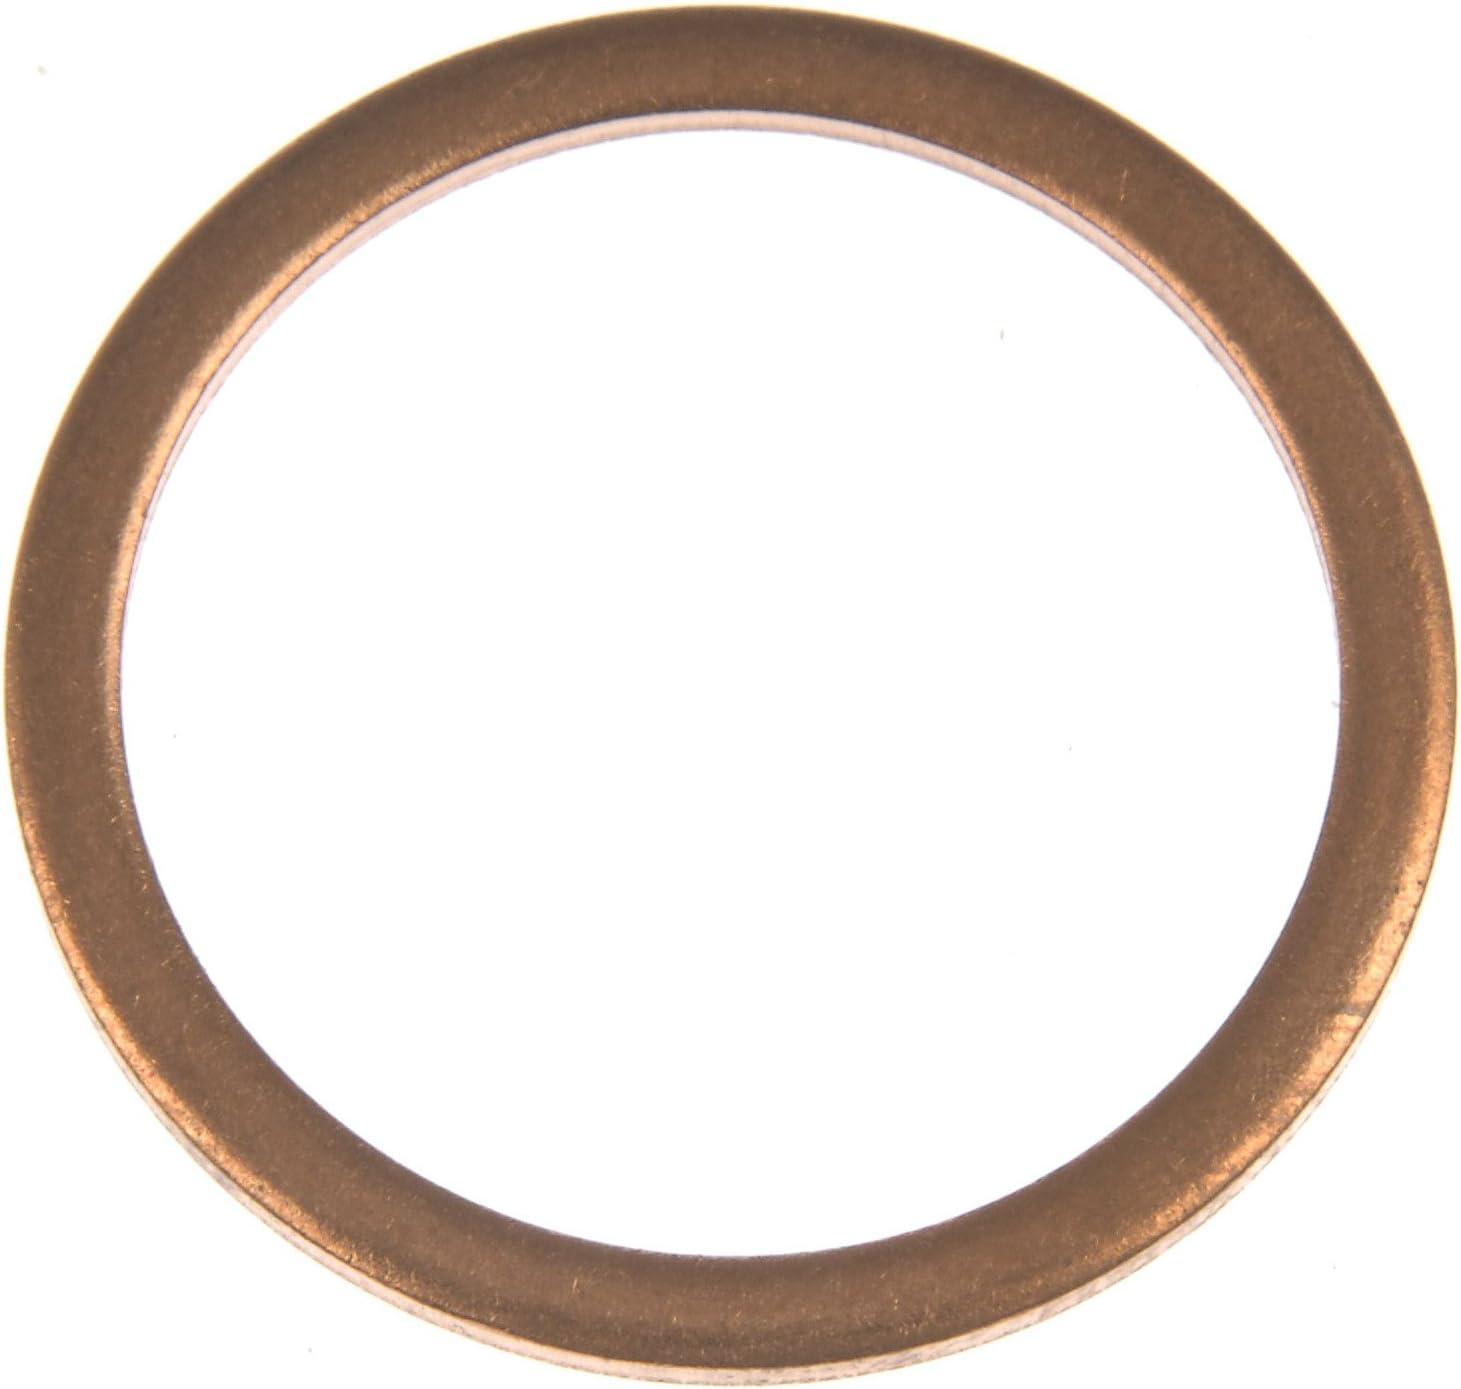 Dorman 65276 Copper Oil Drain Plug Gasket Pack of 2